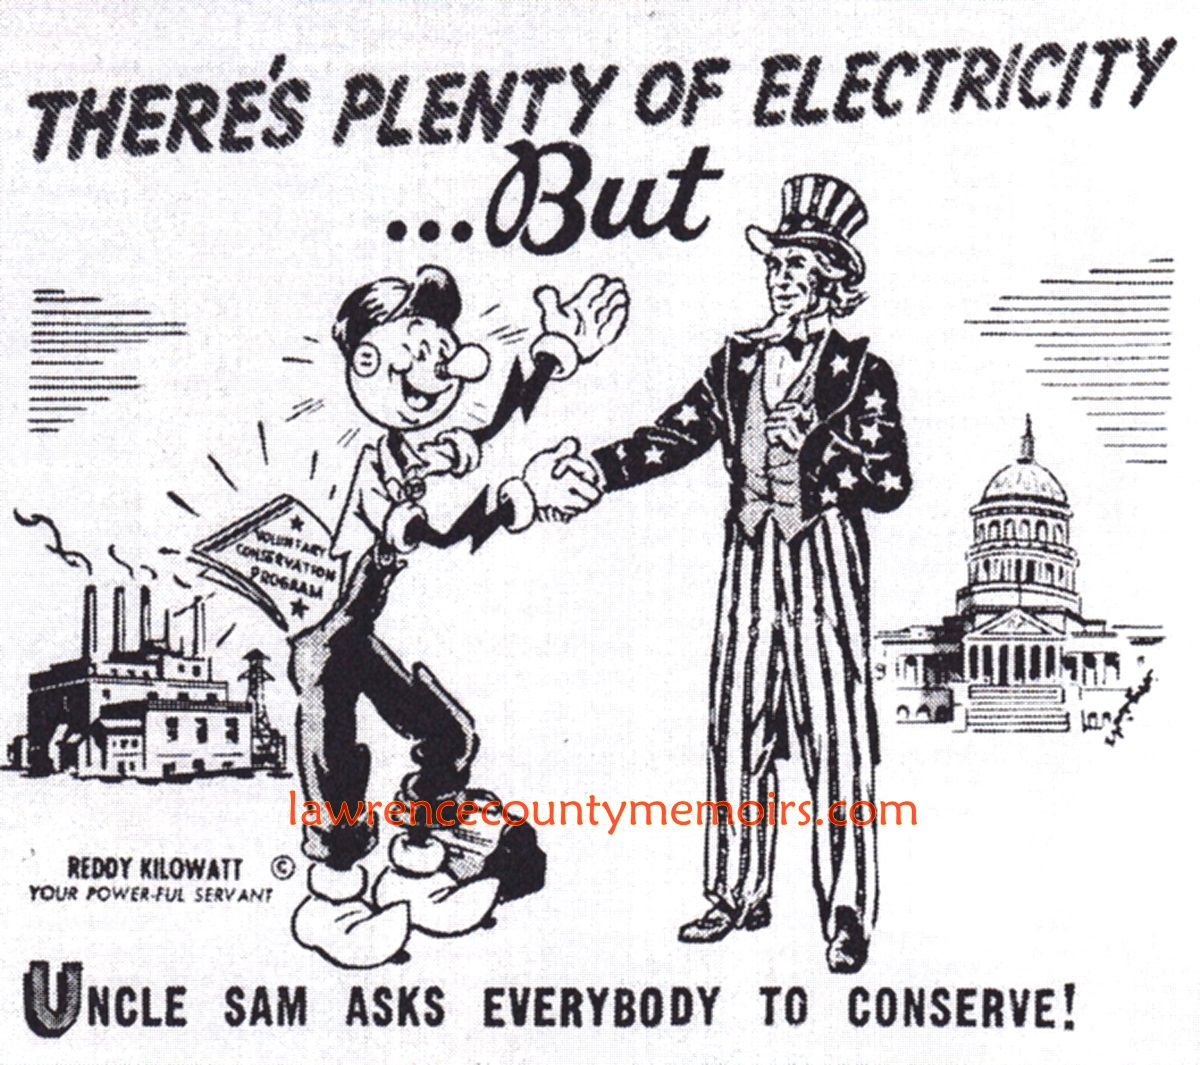 Lawrence County Memoirs Reddy Kilowatt Penn Power Sign